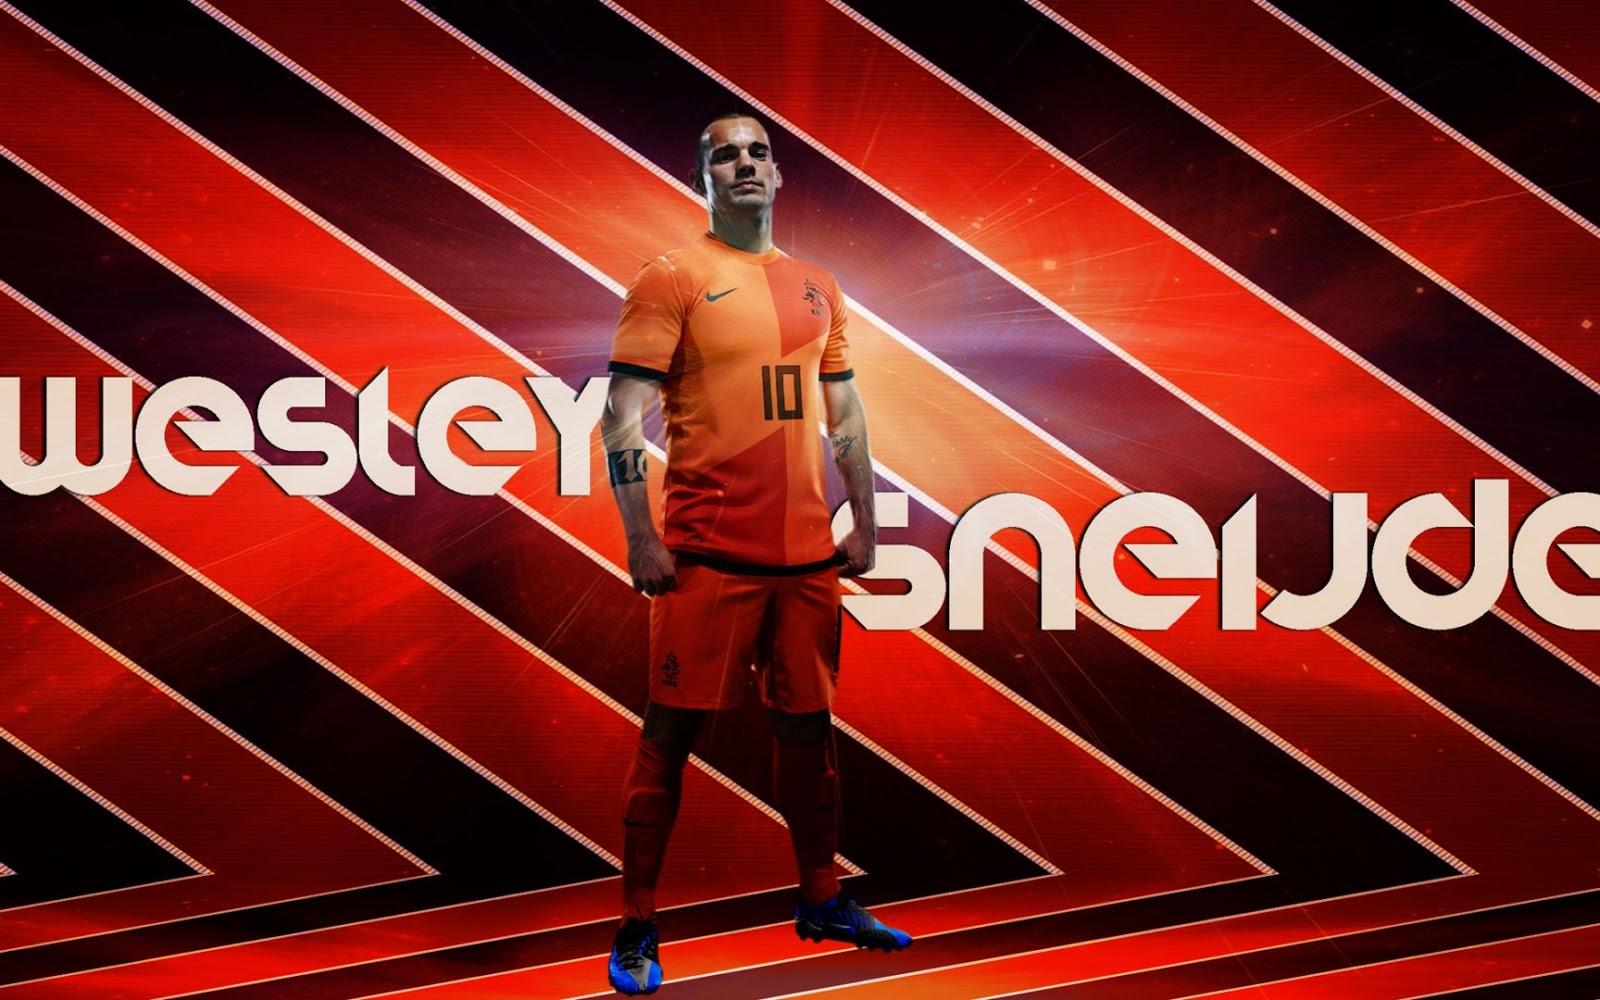 wesley+sneijder+galatasaray+resimleri+rooteto+22 Wesley Sneijder Galatasaray HD Resimleri